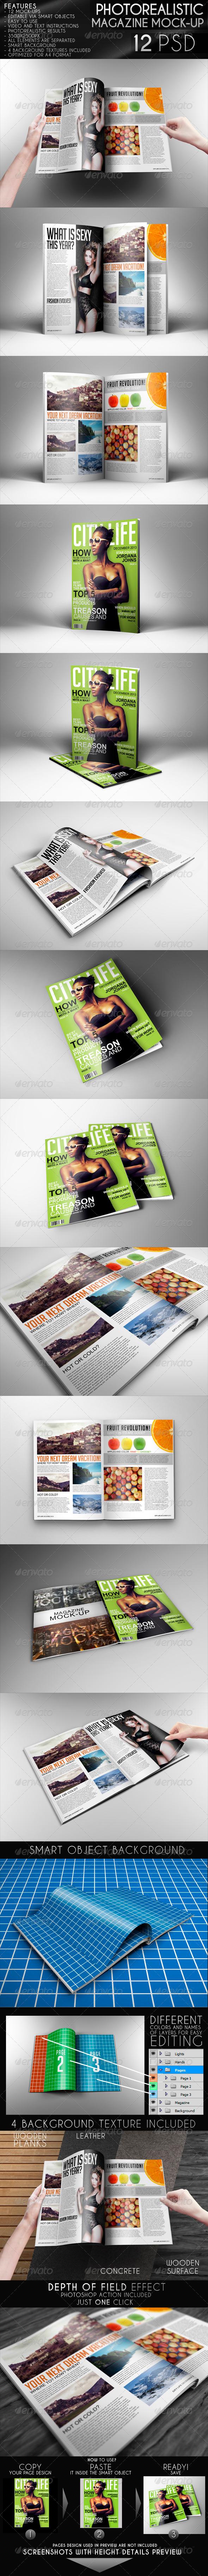 GraphicRiver Photorealistic Magazine Mock-Up 6155084